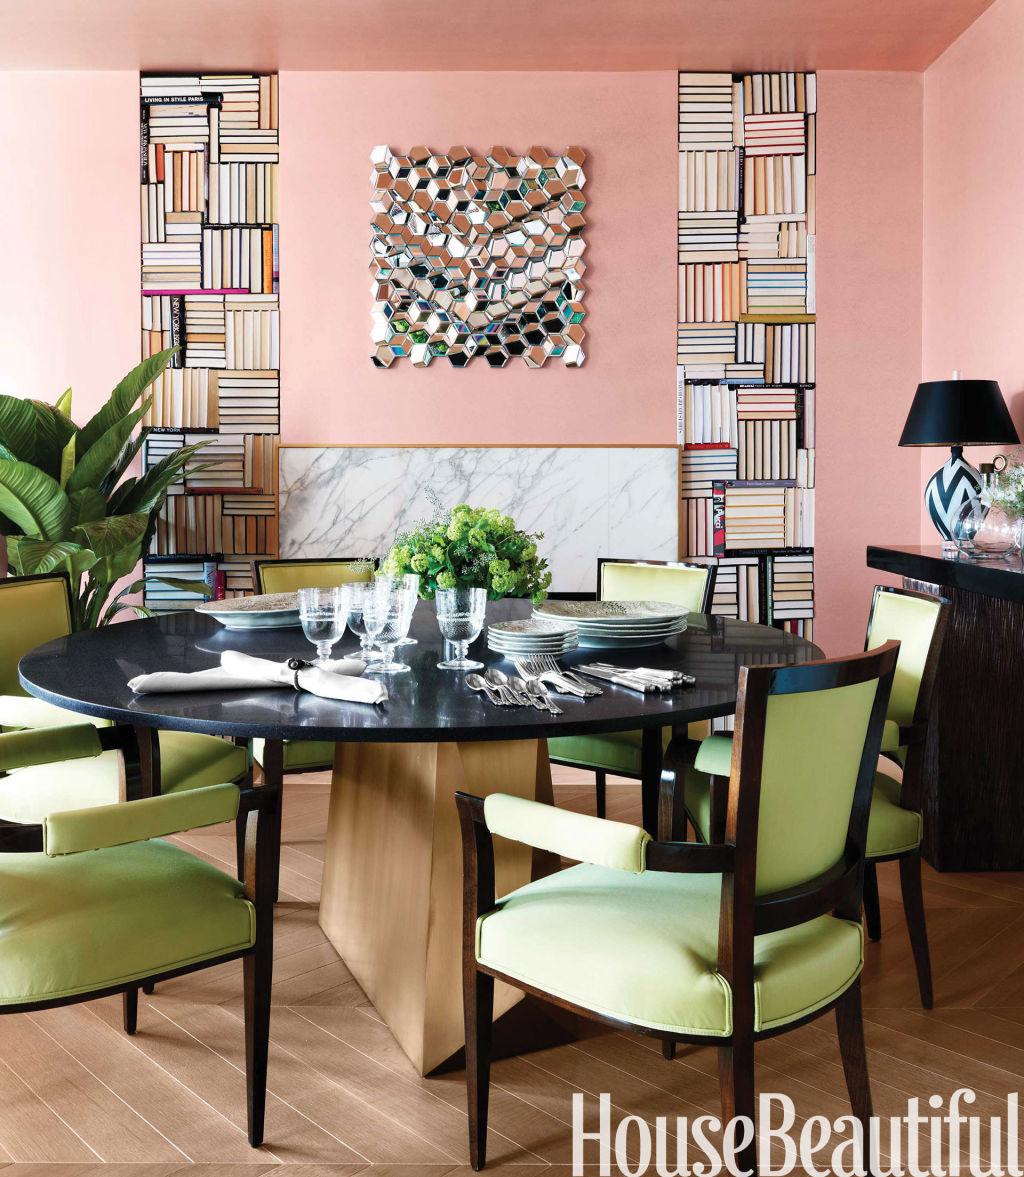 The 15 Most Beautiful Kitchens On Pinterest: Designer Visions Jamie Drake